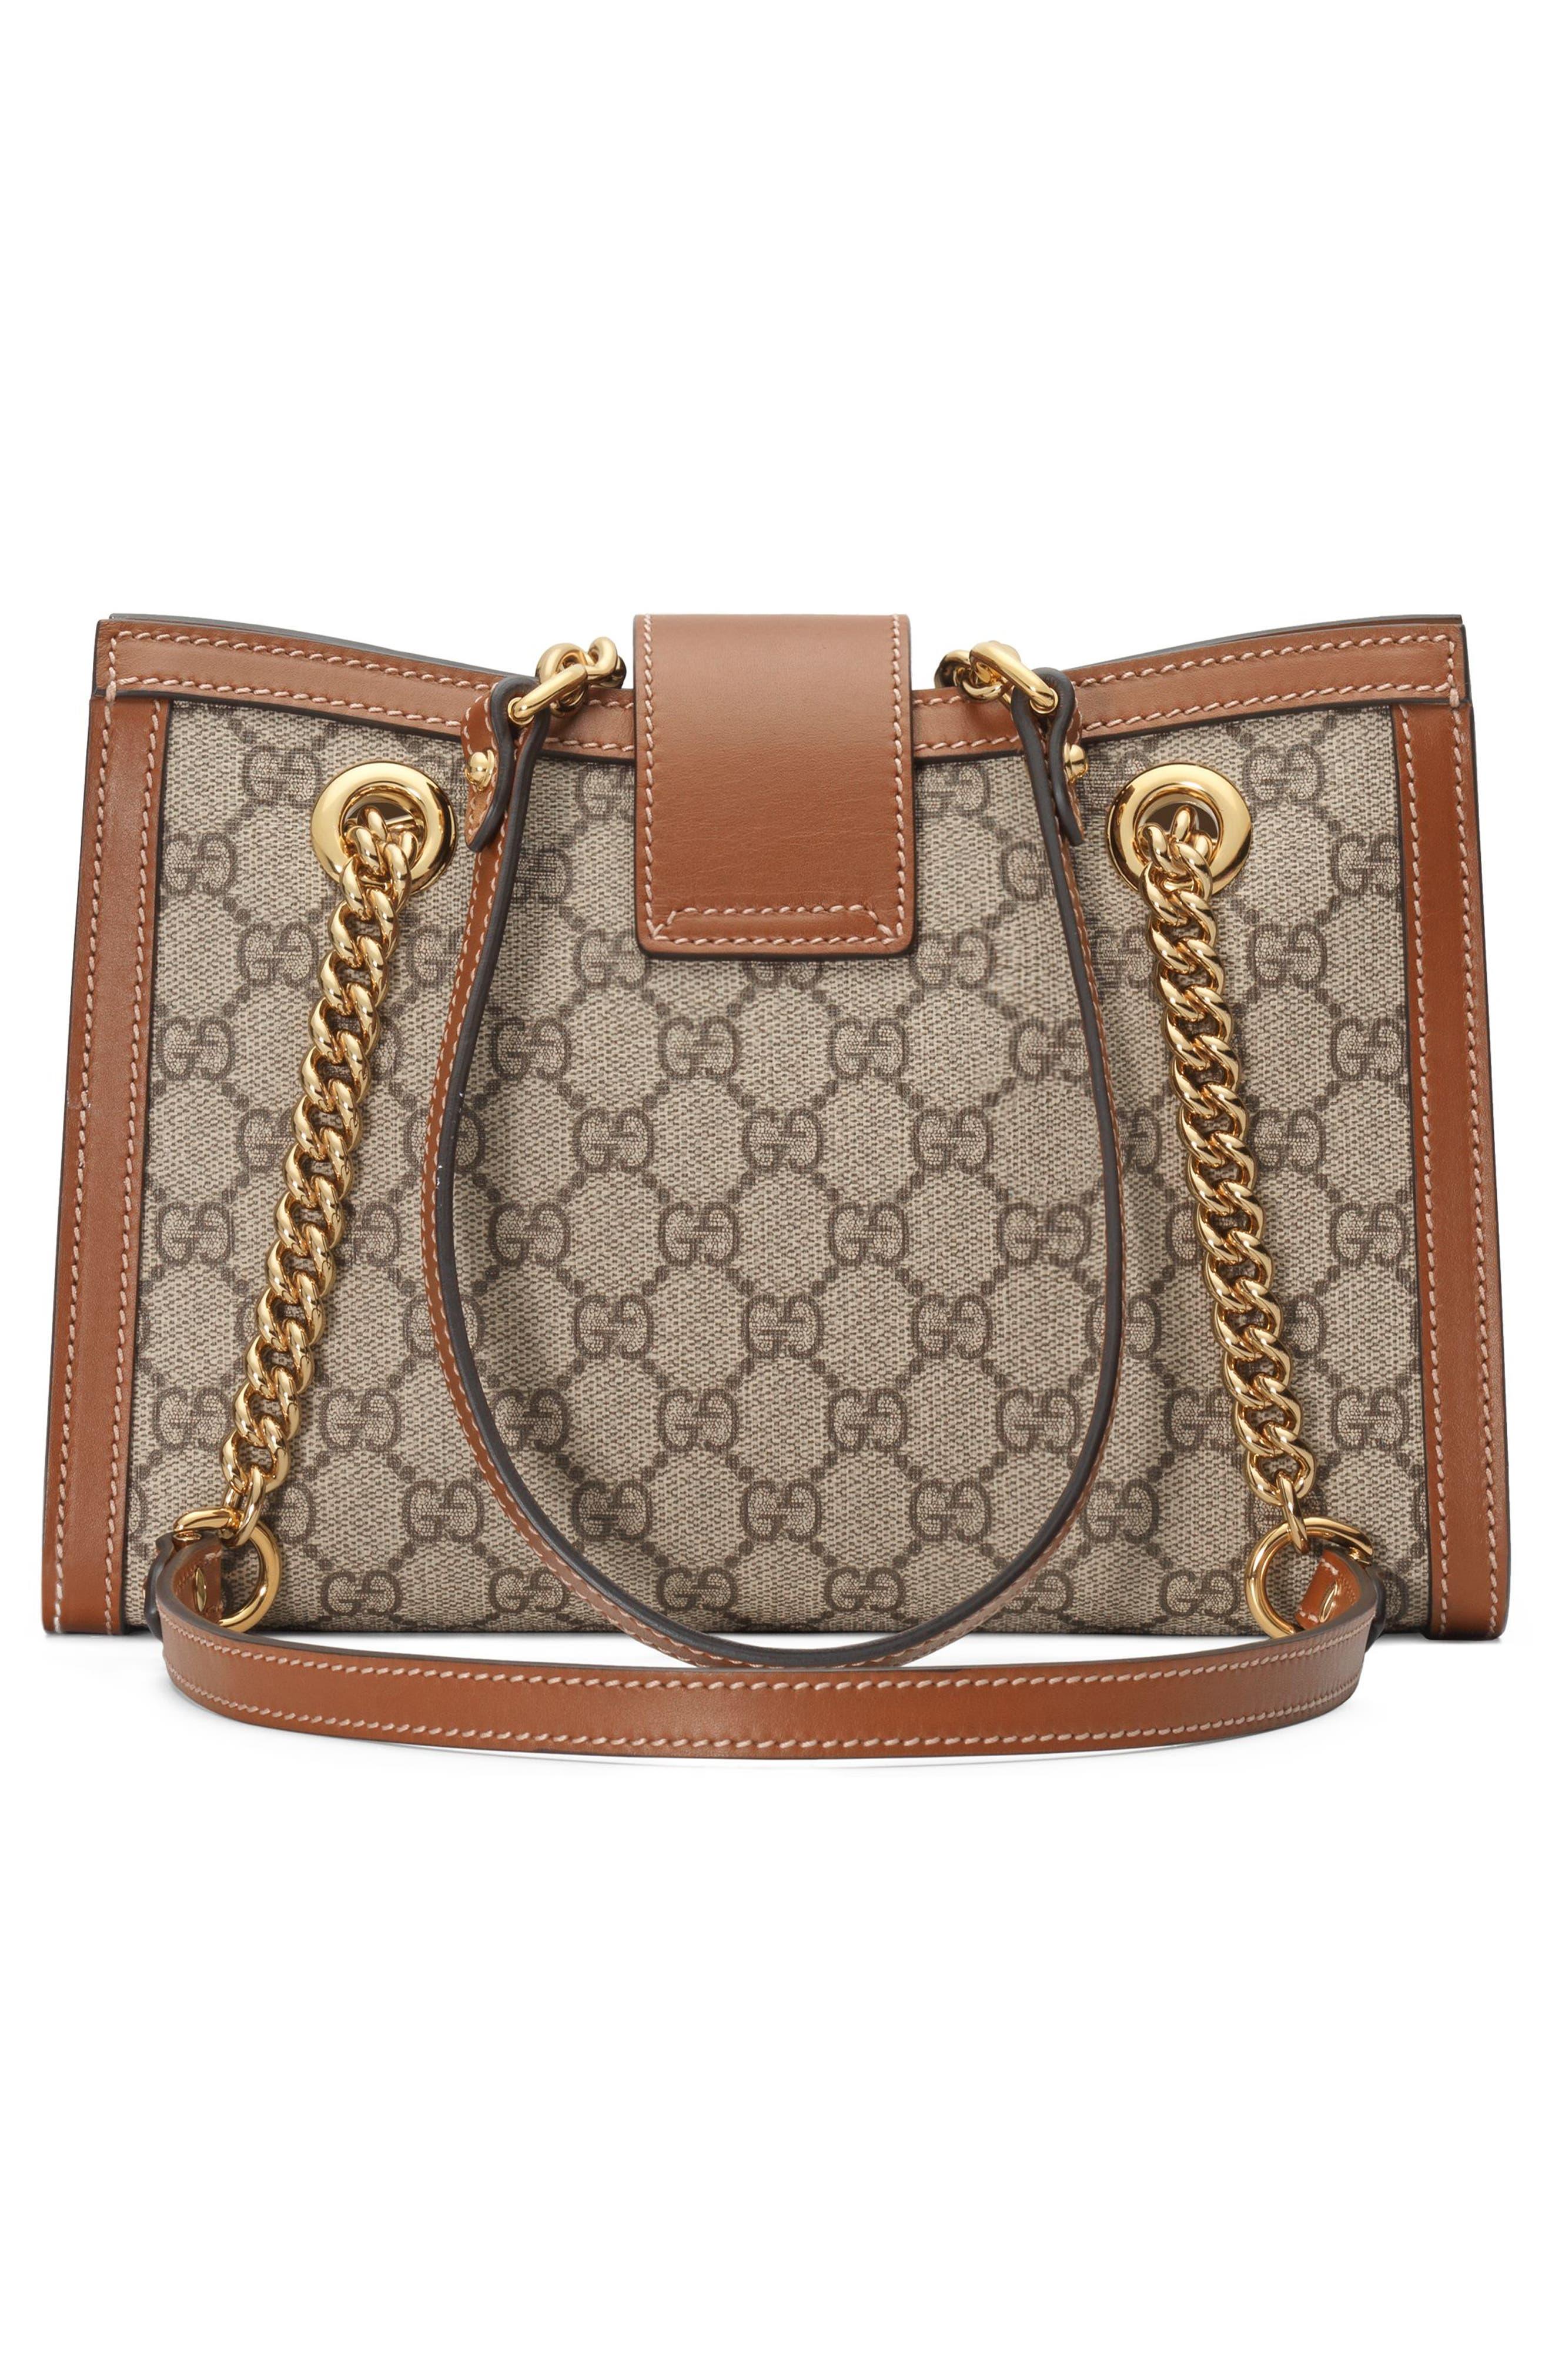 Small Padlock GG Supreme Shoulder Bag,                             Alternate thumbnail 2, color,                             BEIGE EBONY/ TUSCANY